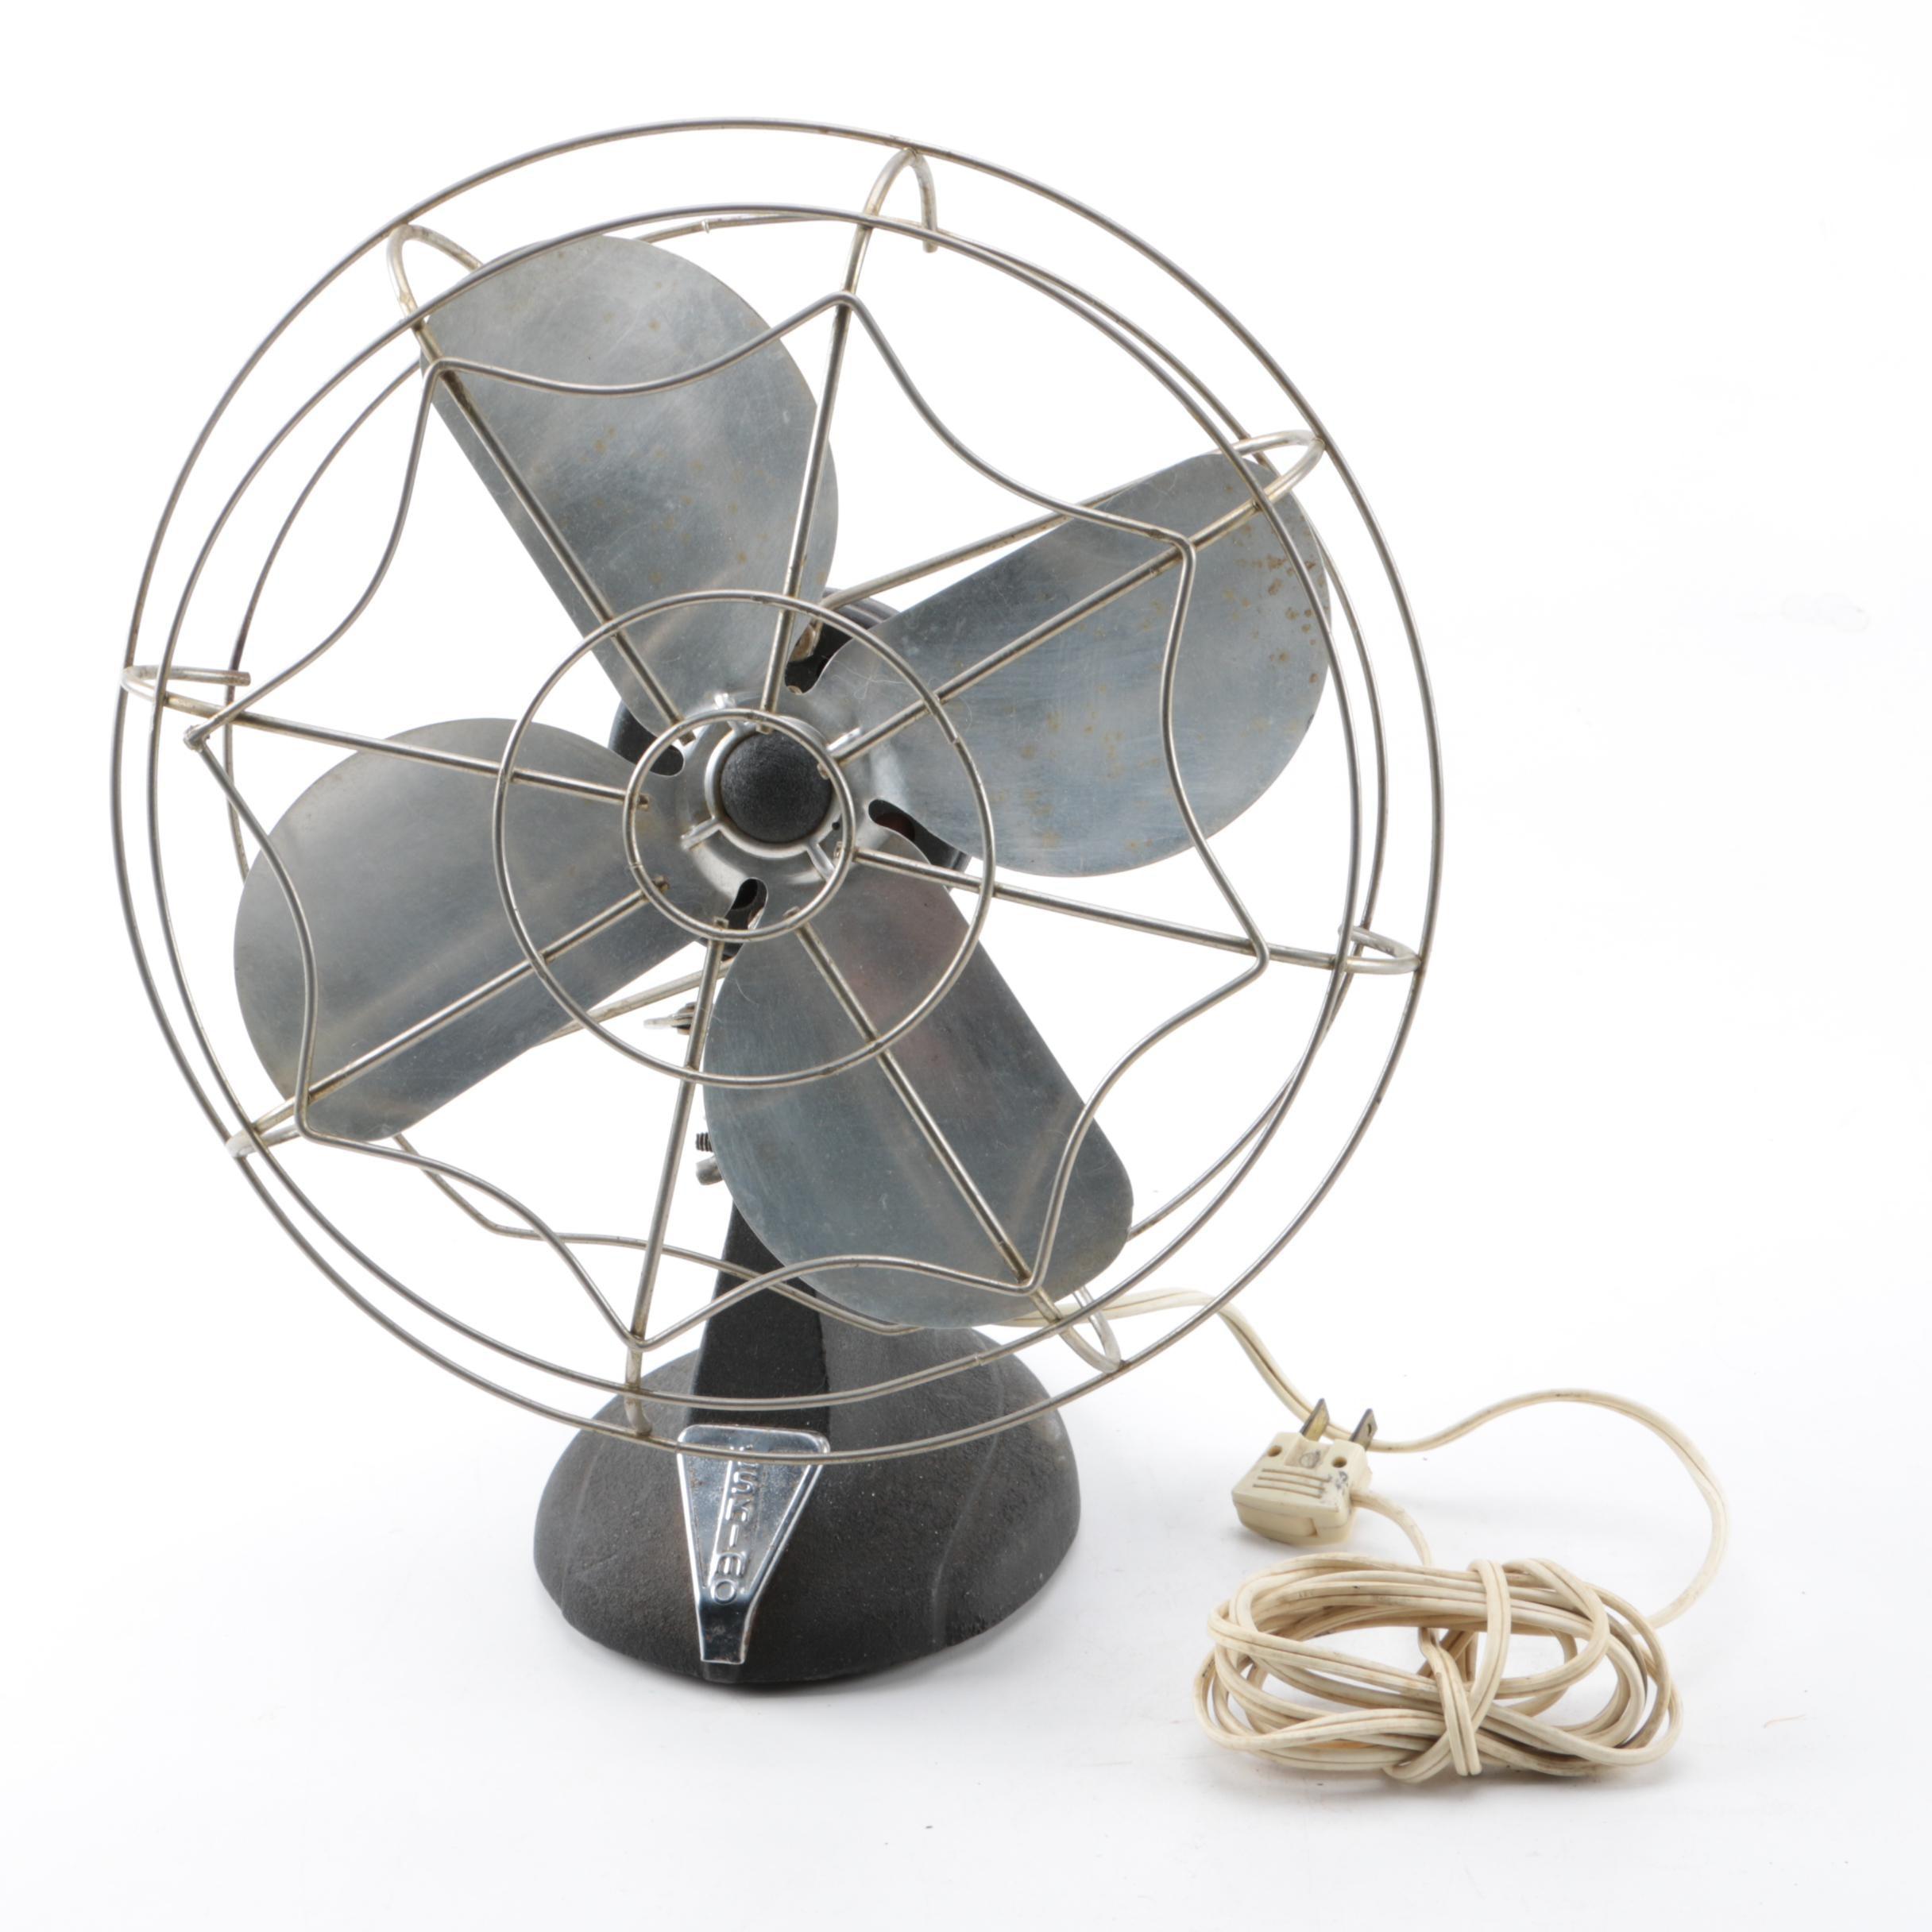 Esk-Mo Portable Fan